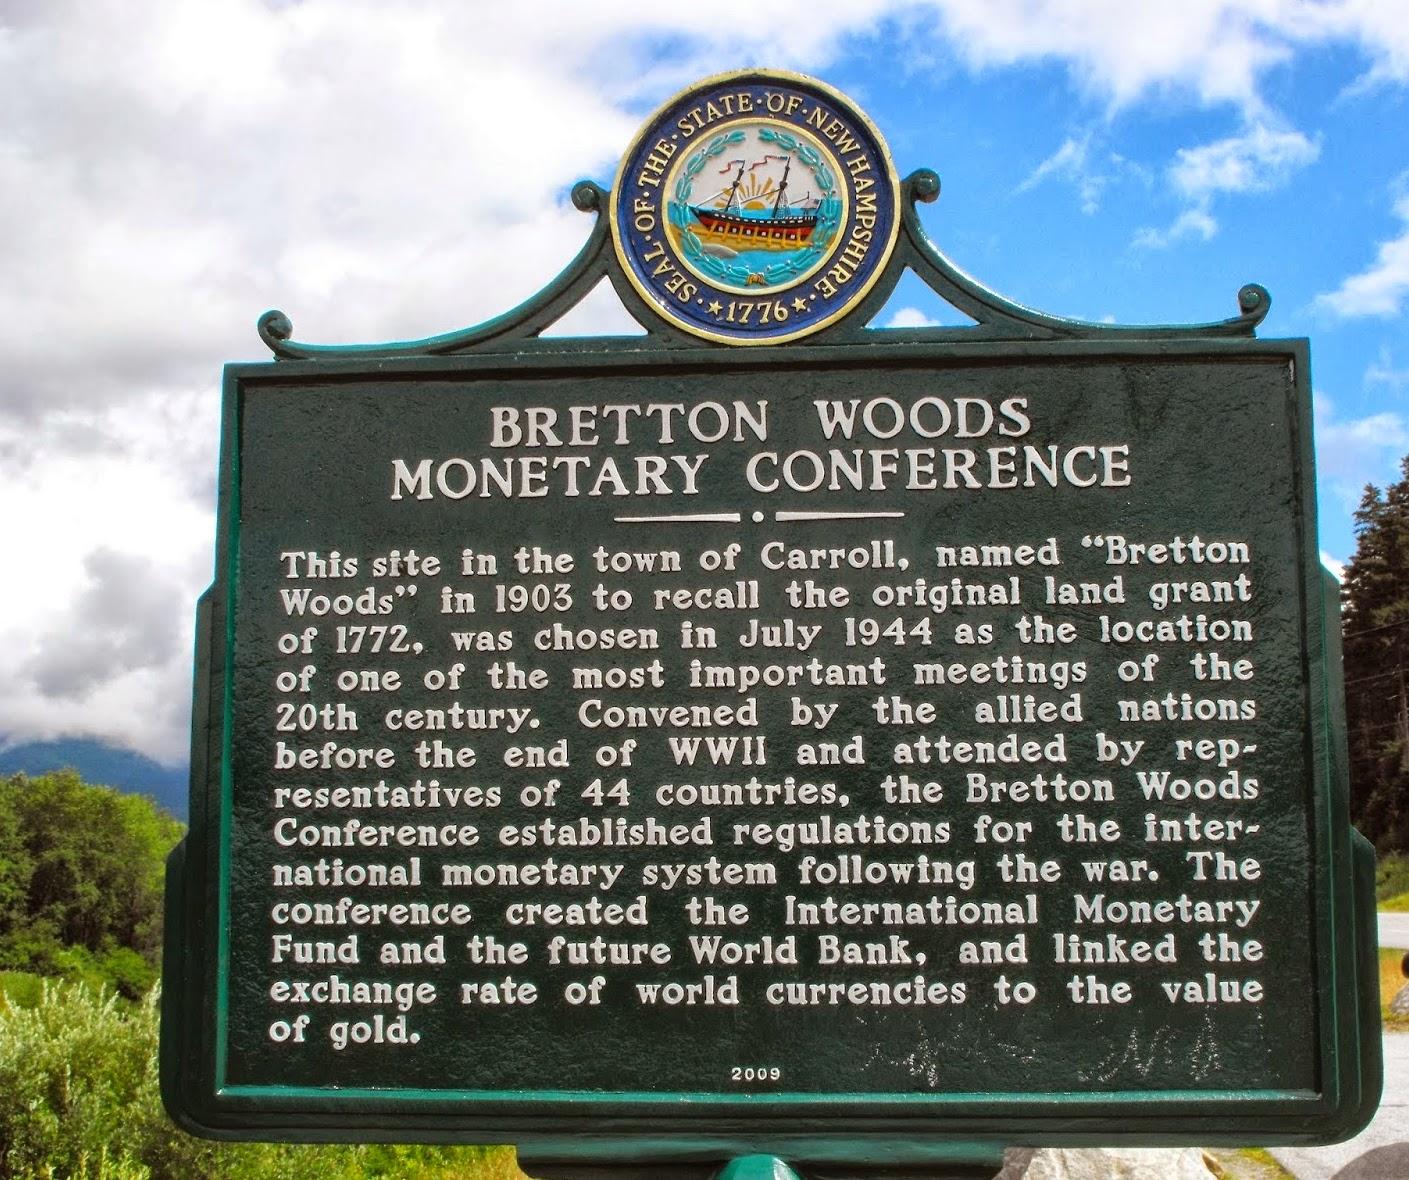 NH-Road-Marker-Bretton-Woods-Monetary-Conference.jpg